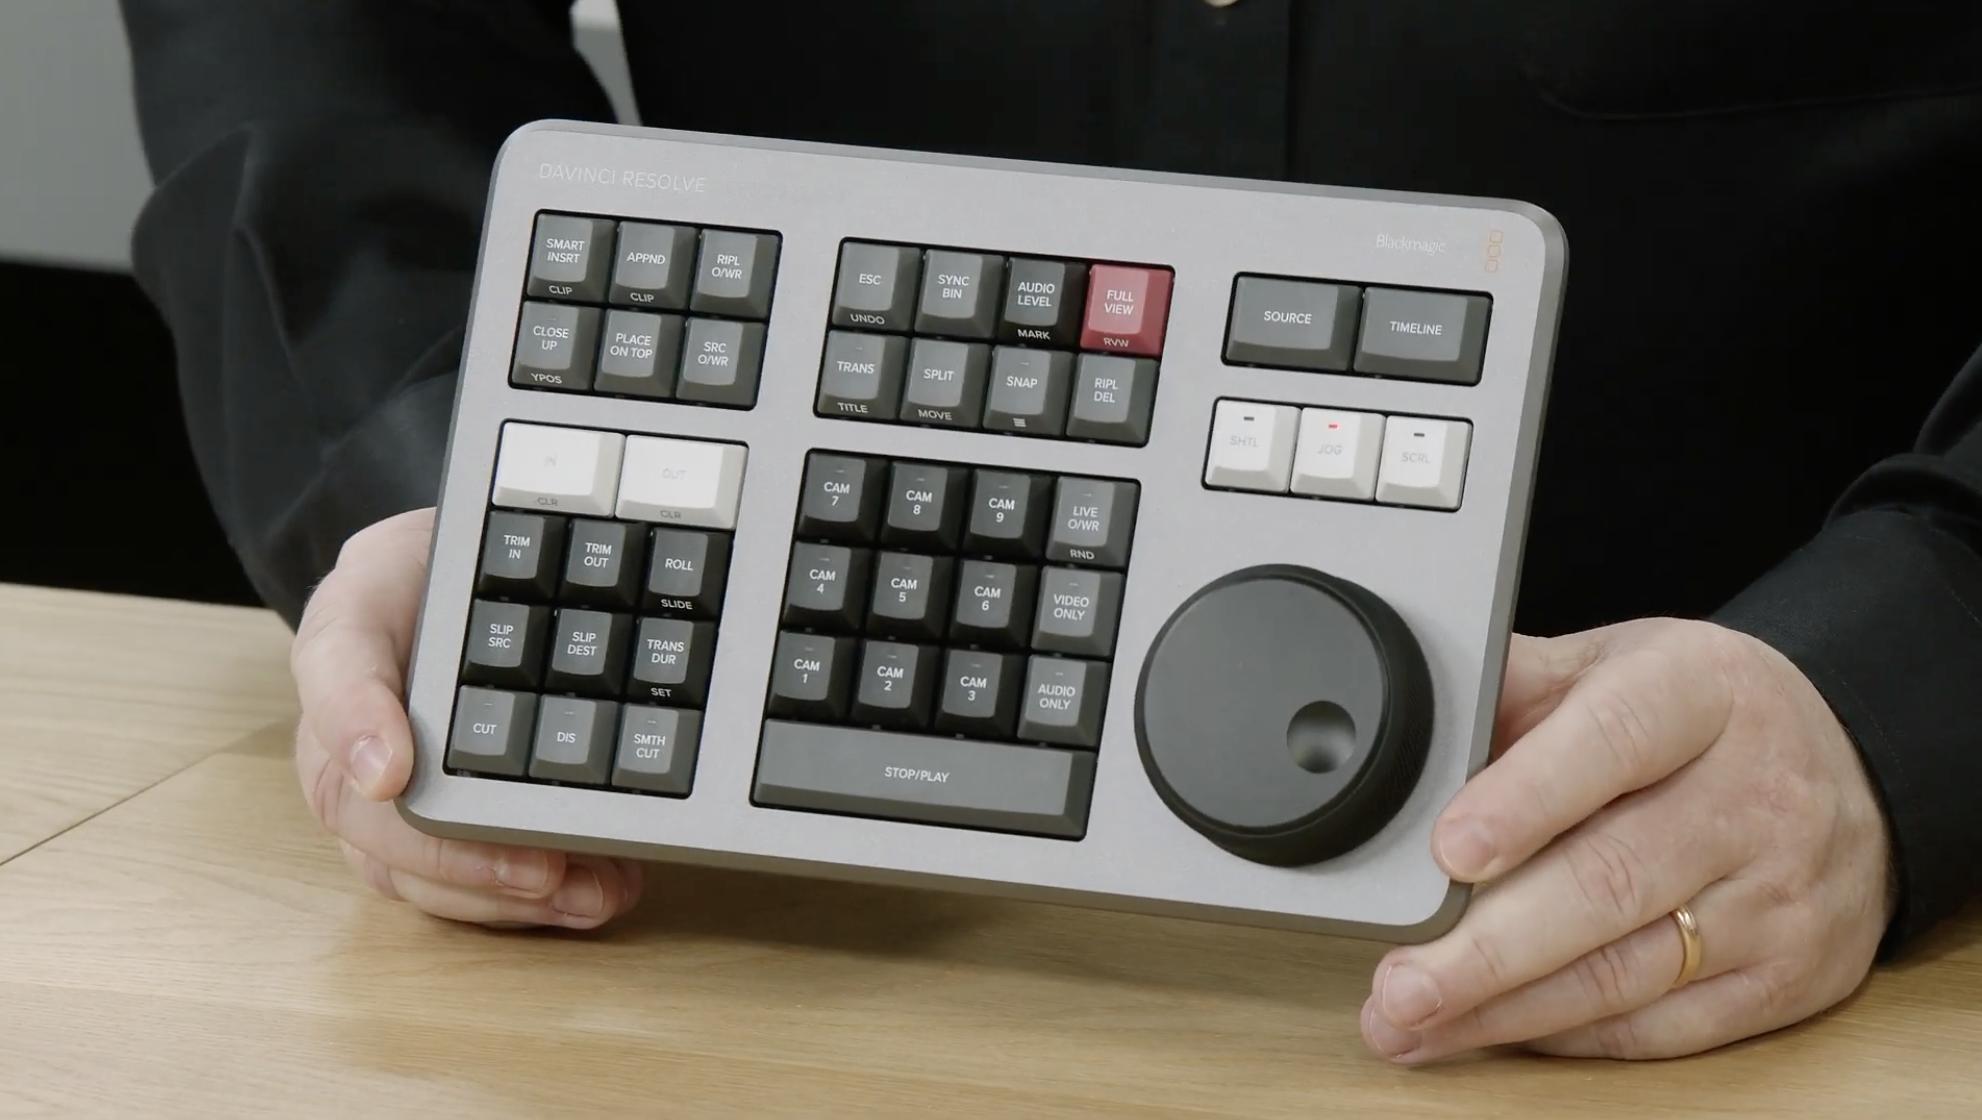 Blackmagic Introduce 'Speed Editor' for DaVinci Resolve – Simon McGuire